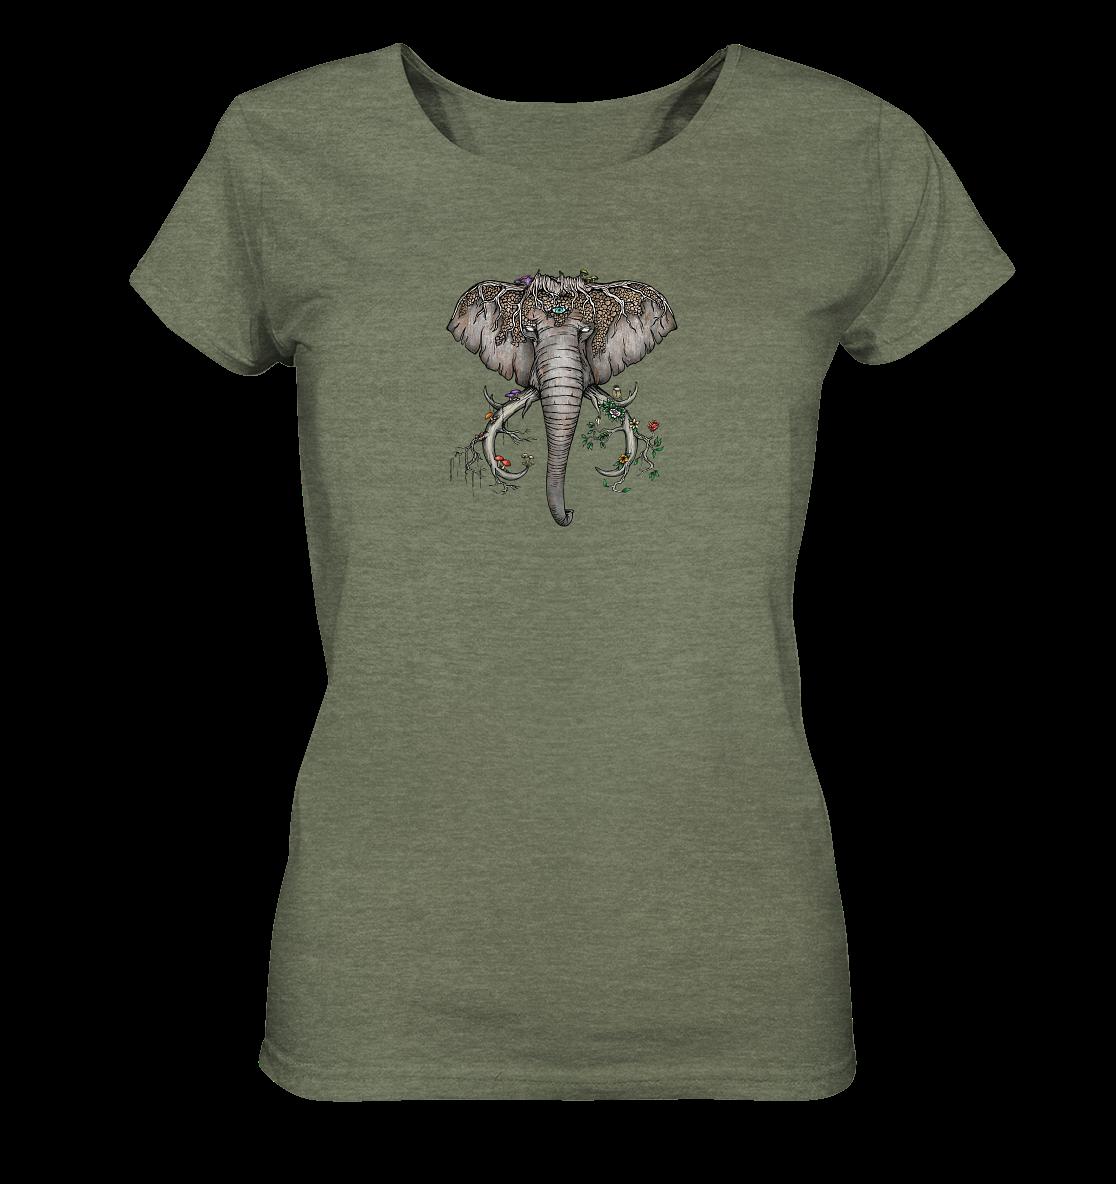 front-ladies-organic-shirt-meliert-616b52-1116x-1.png